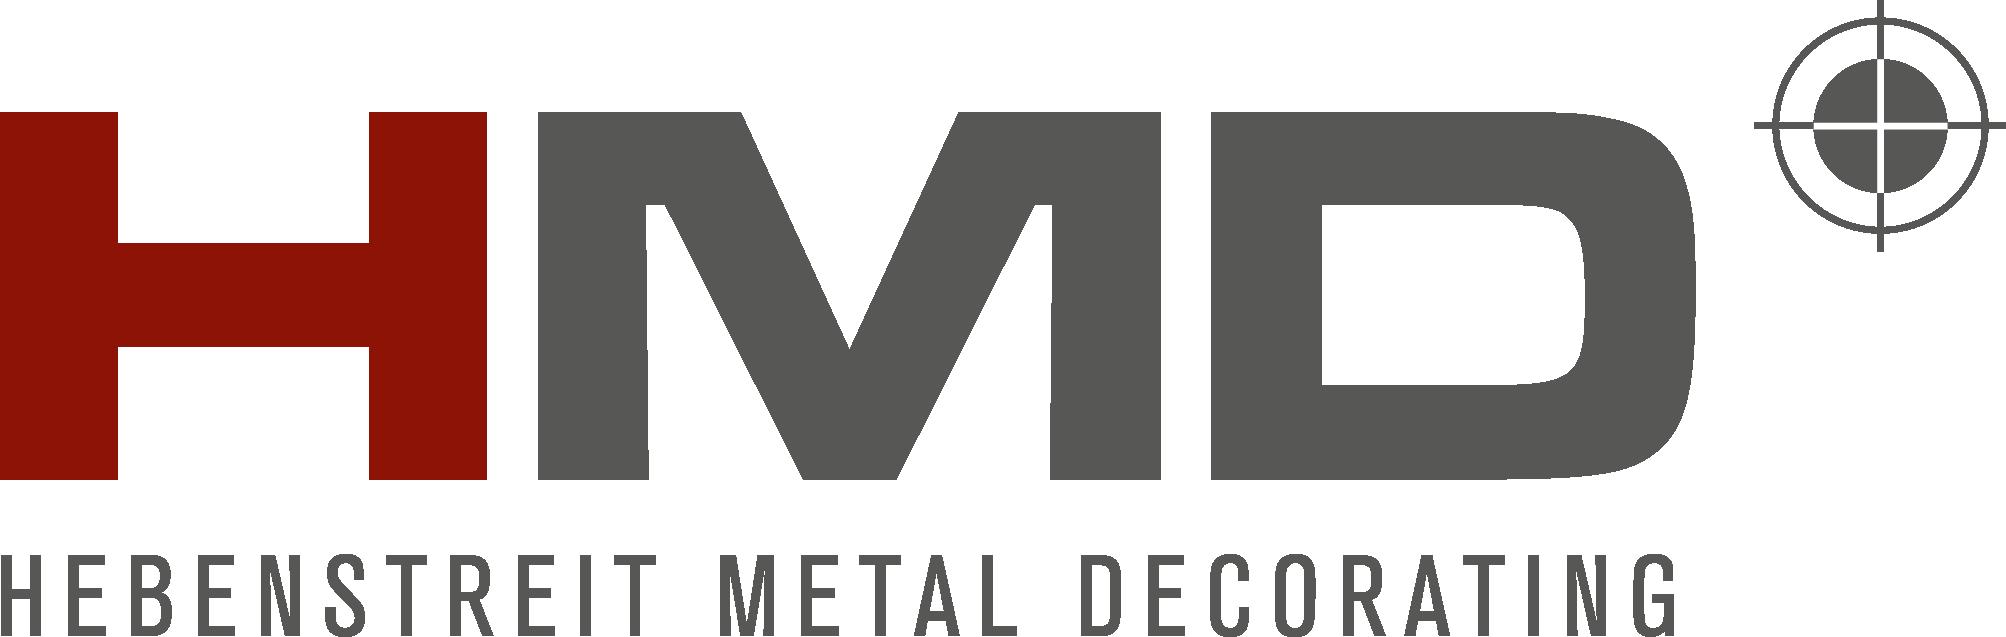 https://www.inbraakbeveiliging-slotenservice.nl/wp-content/uploads/2021/02/Hmd-logo.png